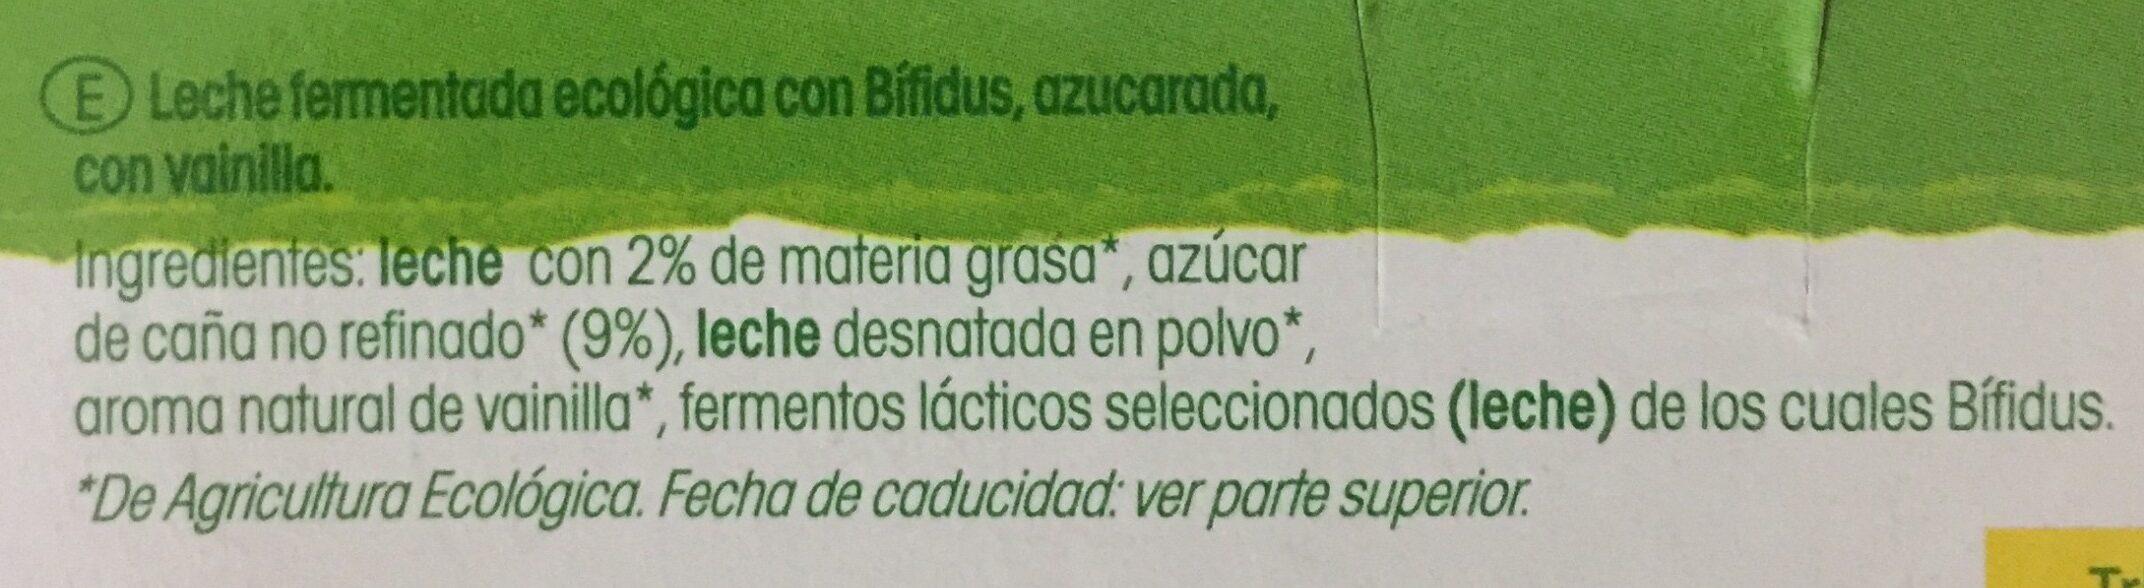 Bífidus sabor vainilla ecológico - Ingredientes